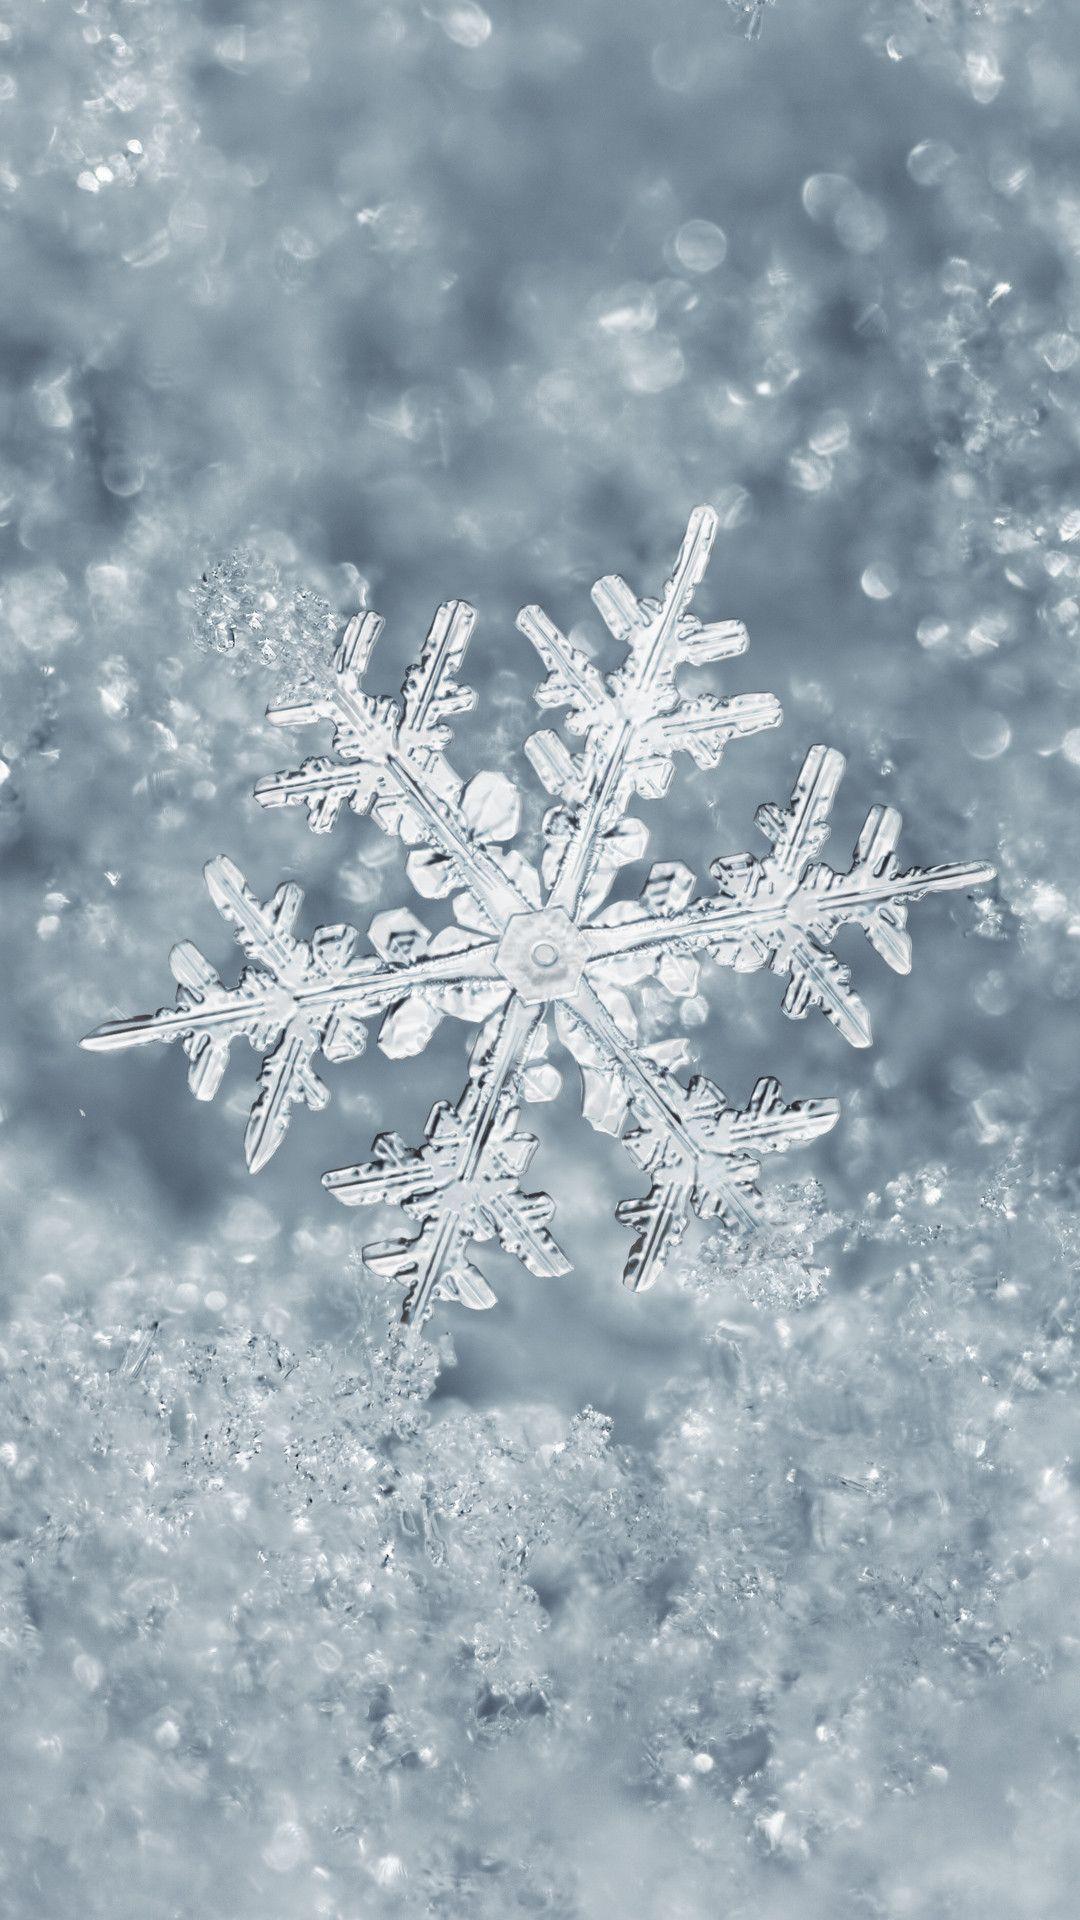 1080x1920 Ice Snowflake Fondo De Pantalla De Iphone 7 Plus